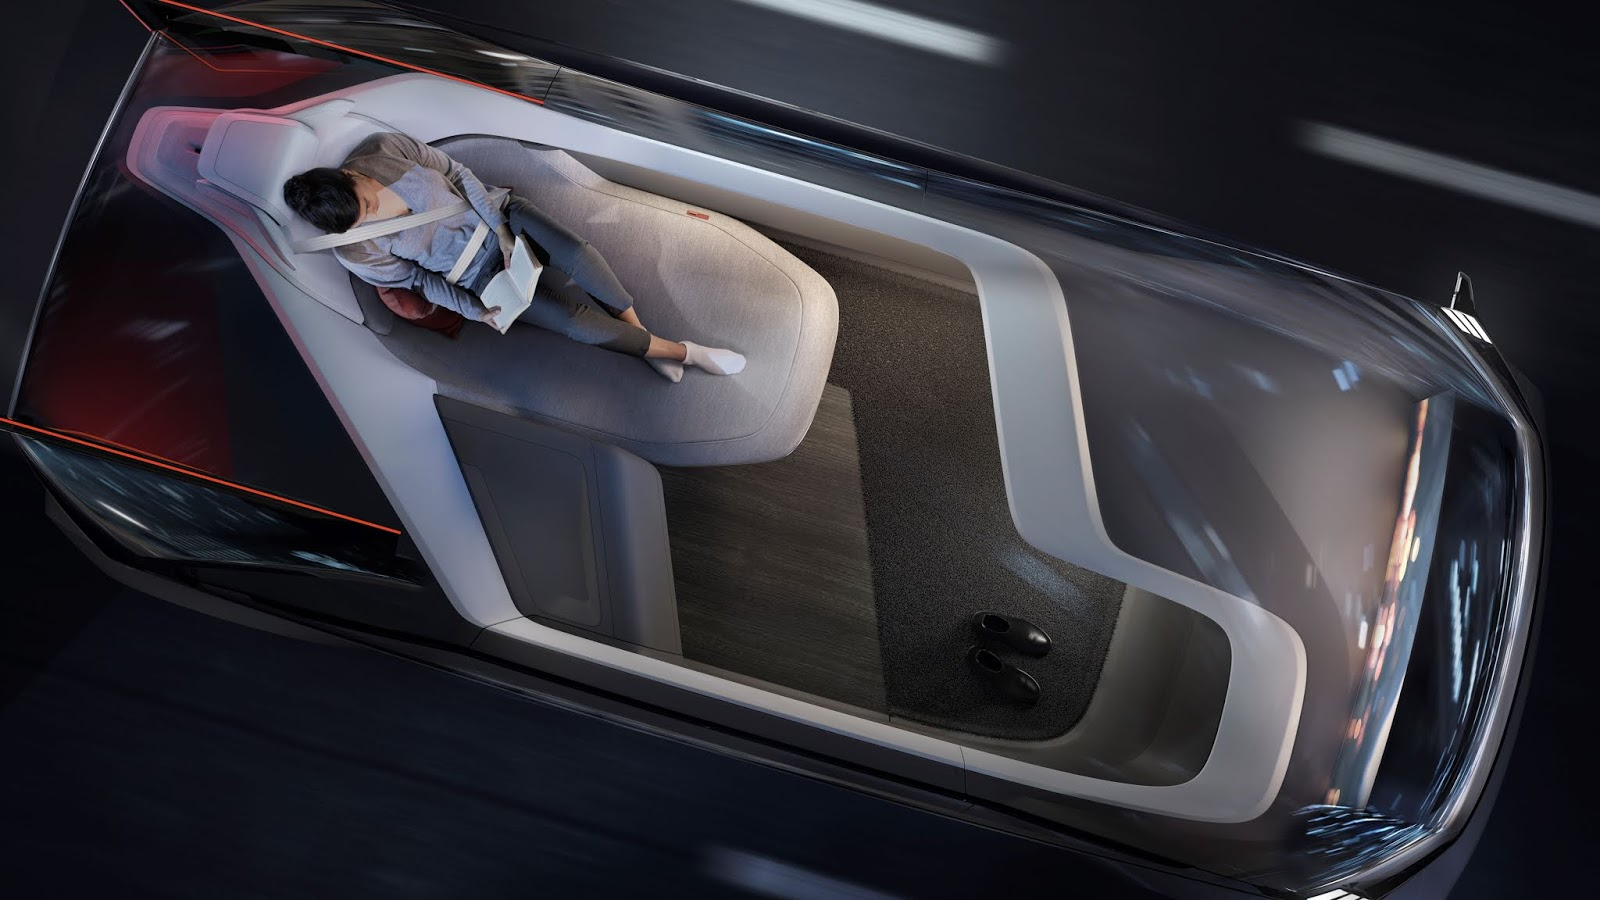 237046 Volvo 360c Interior Sleeping 1 Το όραμα της Volvo χωρίς... τιμόνι Electric cars, Volvo, αυτόνομα, Αυτόνομη οδήγηση, Τεχνολογία